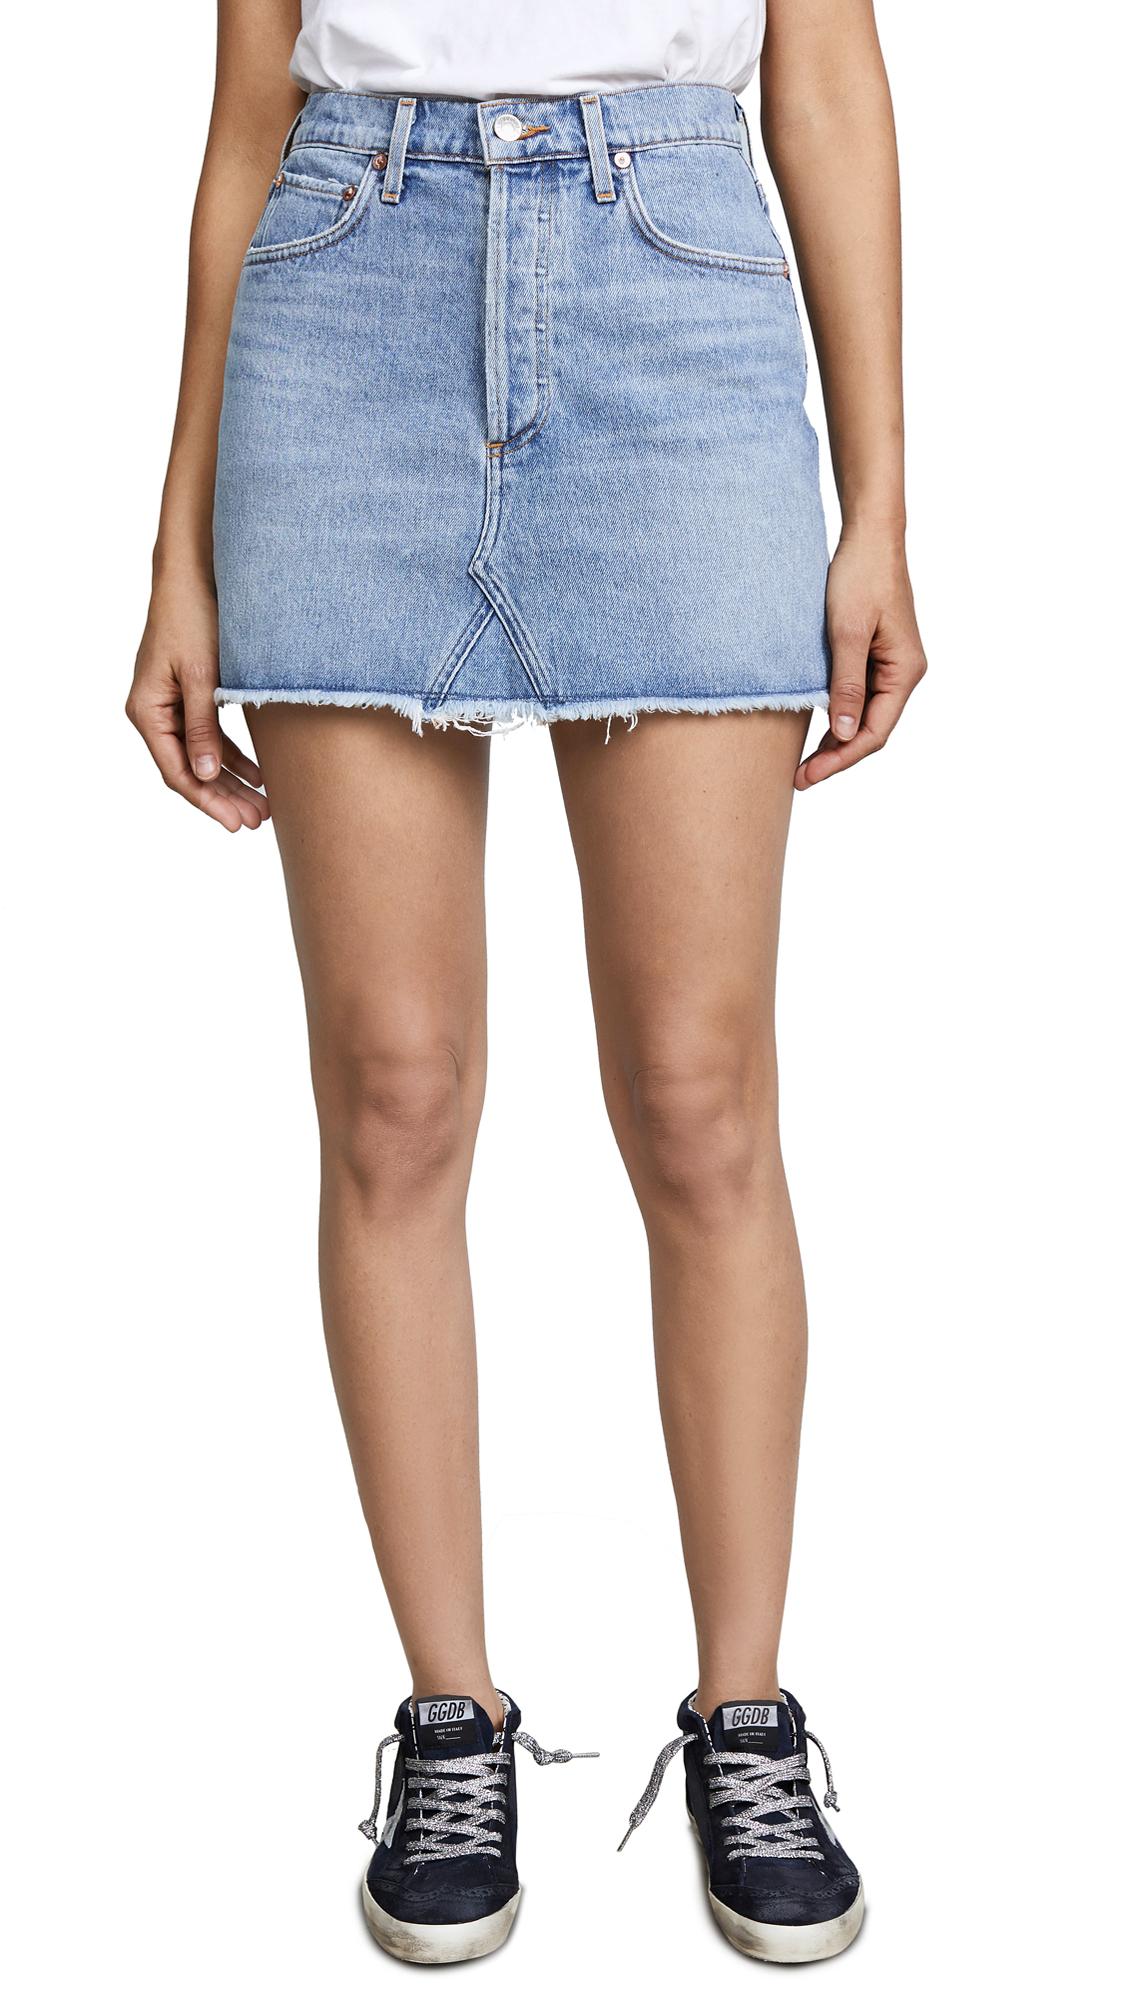 AGOLDE Quinn High Rise Miniskirt - Devotee